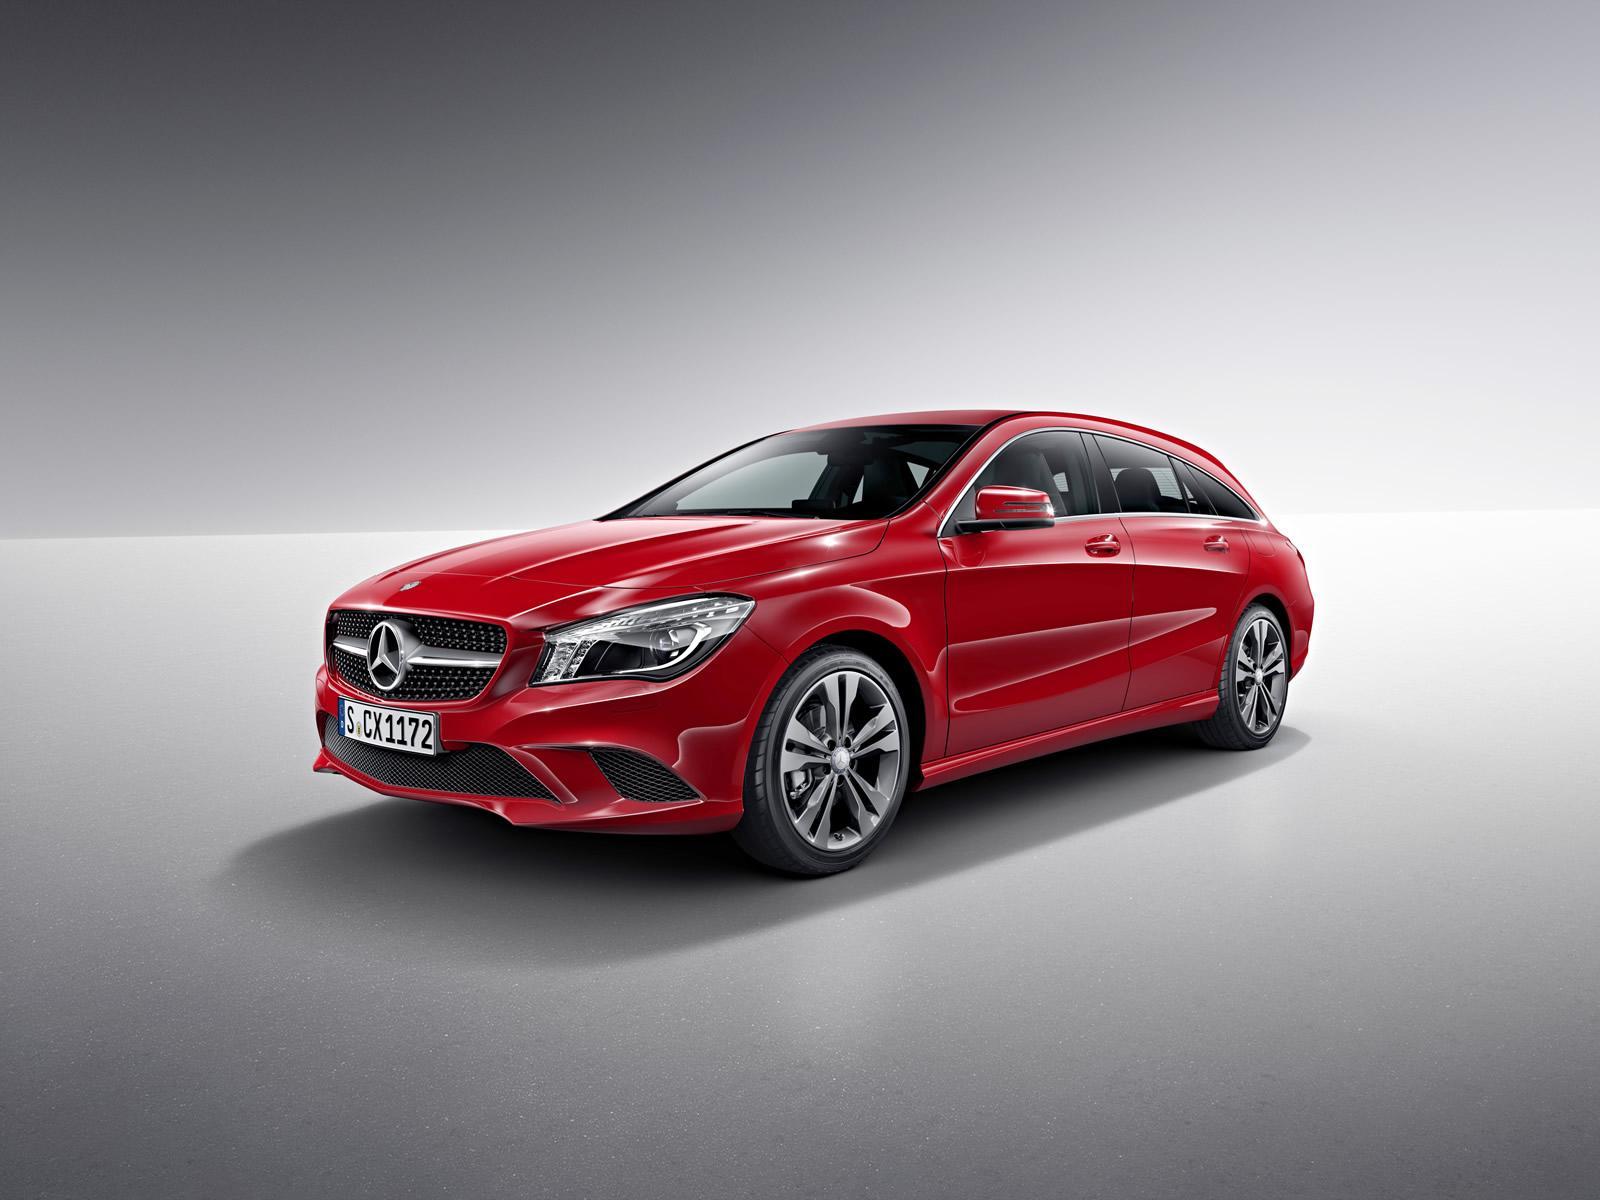 Mercedes CLA e CLA 45 AMG Shooting Brake: motori e dati tecnici